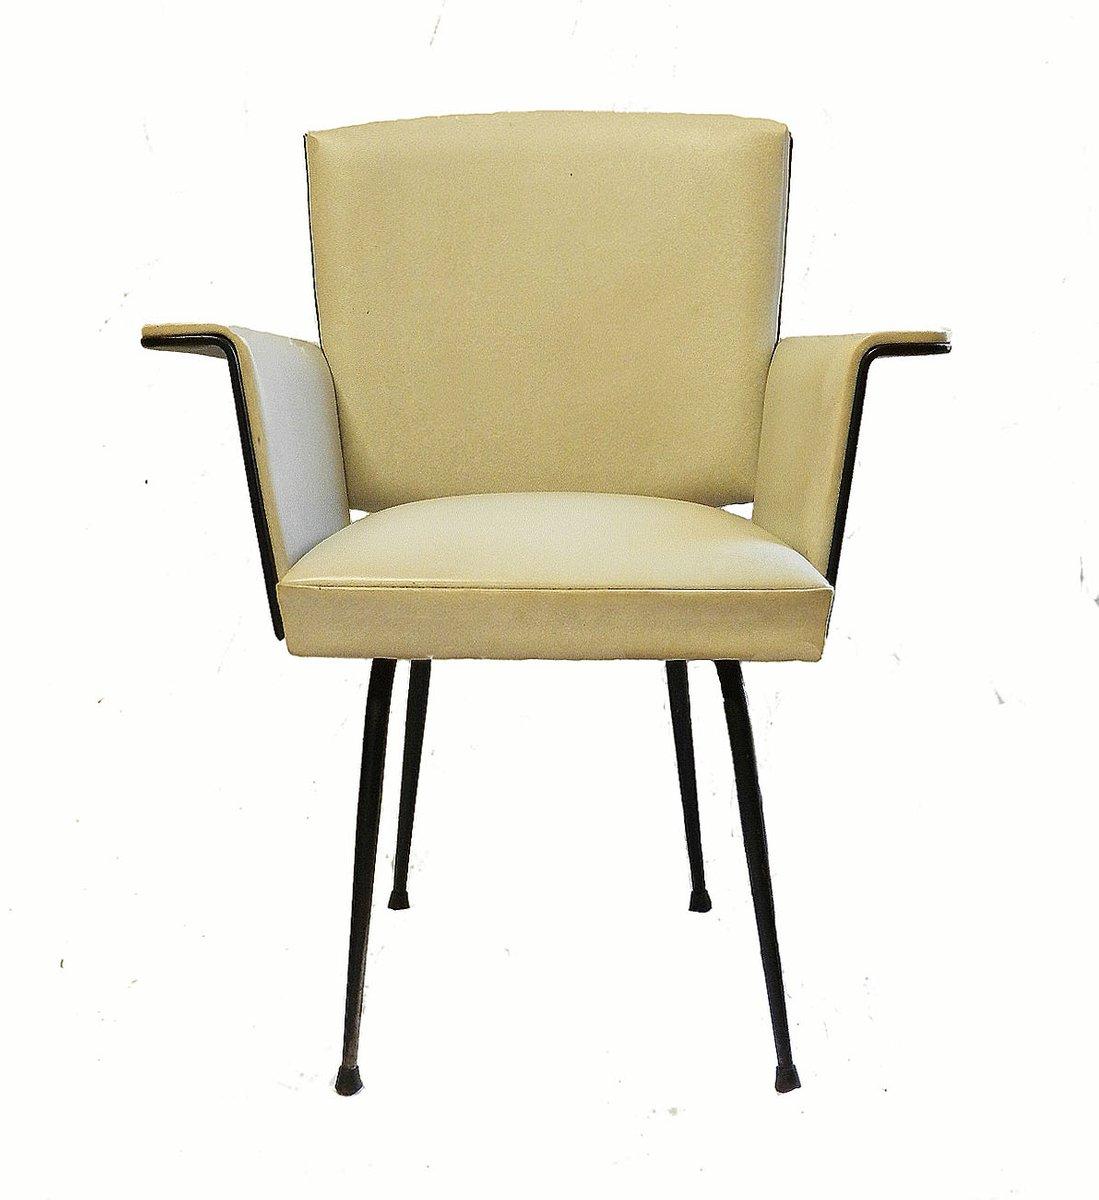 Mid century french cream skai iron armchair for sale at for Cream armchair